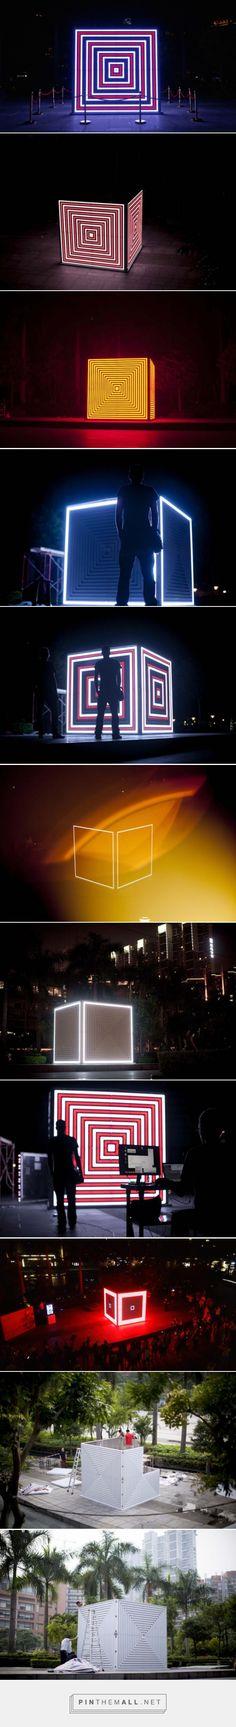 Light and Sound Cube Installation – Fubiz™ - created via http://pinthemall.net